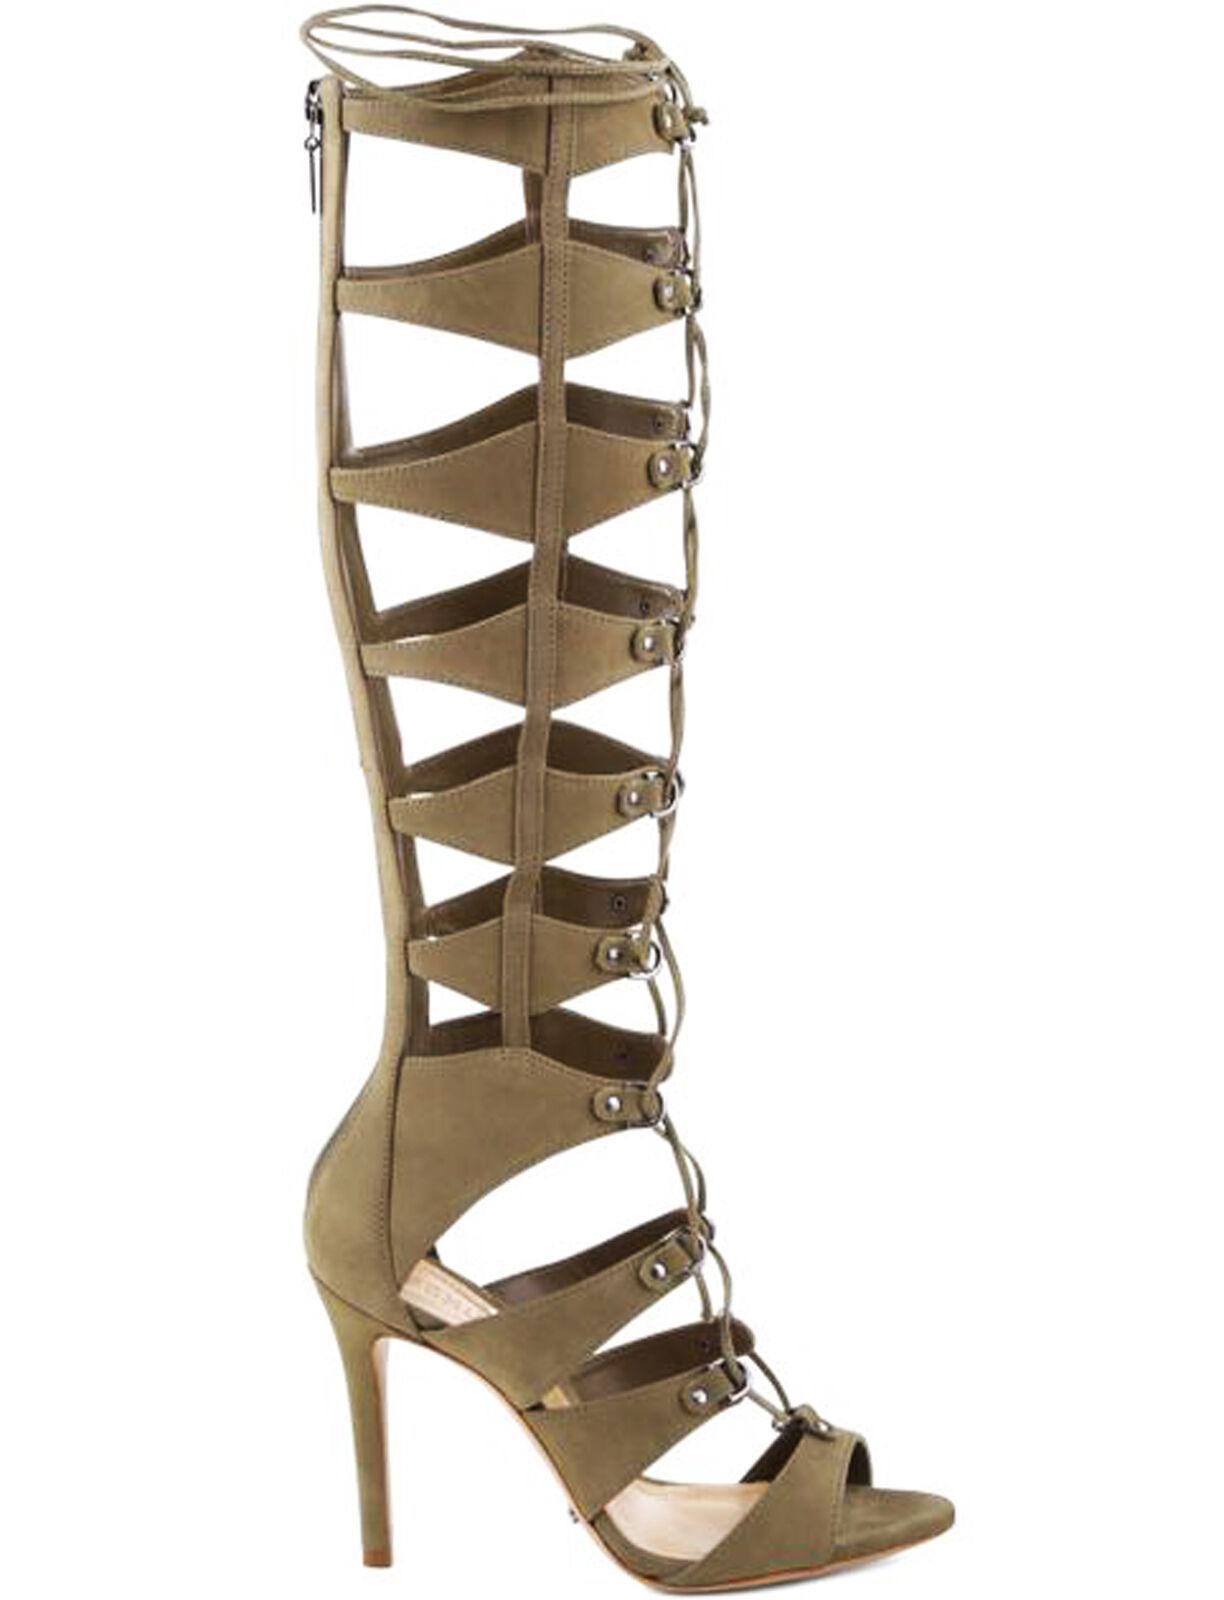 Schutz Saffira Comfrey Olive Grün Lace Up High Heel Sexy Gladiator Sandales